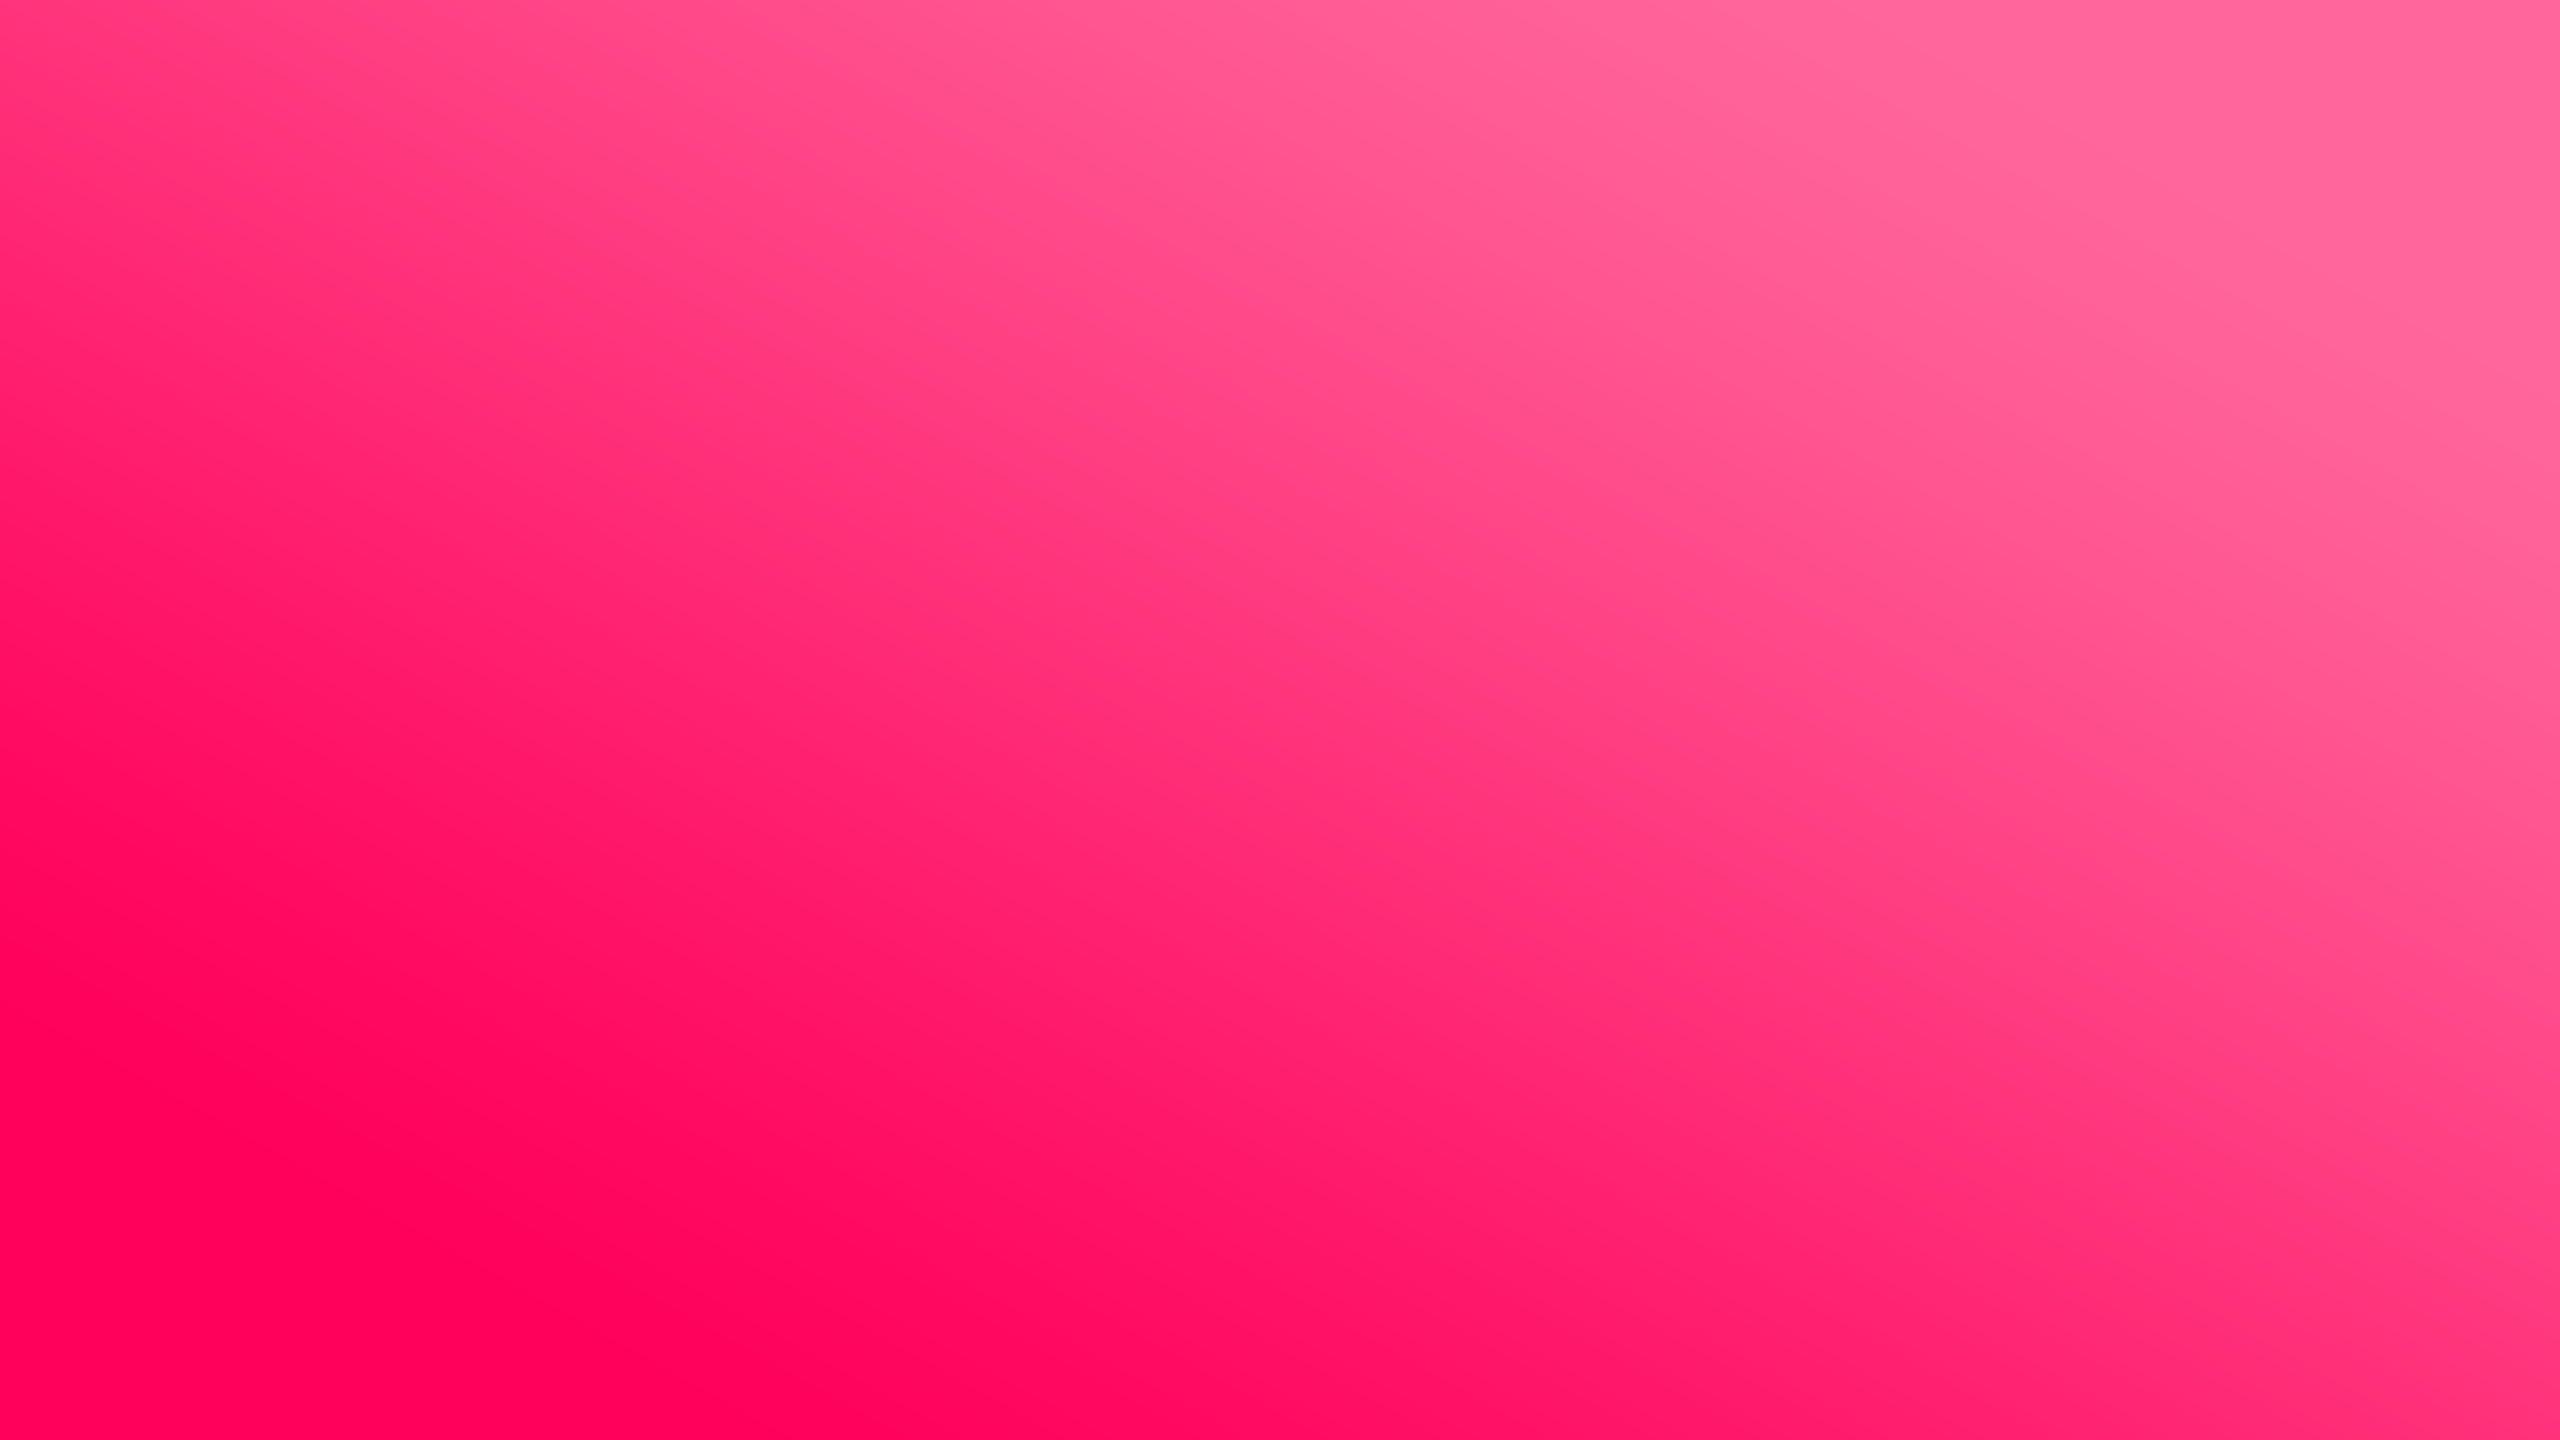 PINK  Victorias Secret The Sexiest Bras Panties